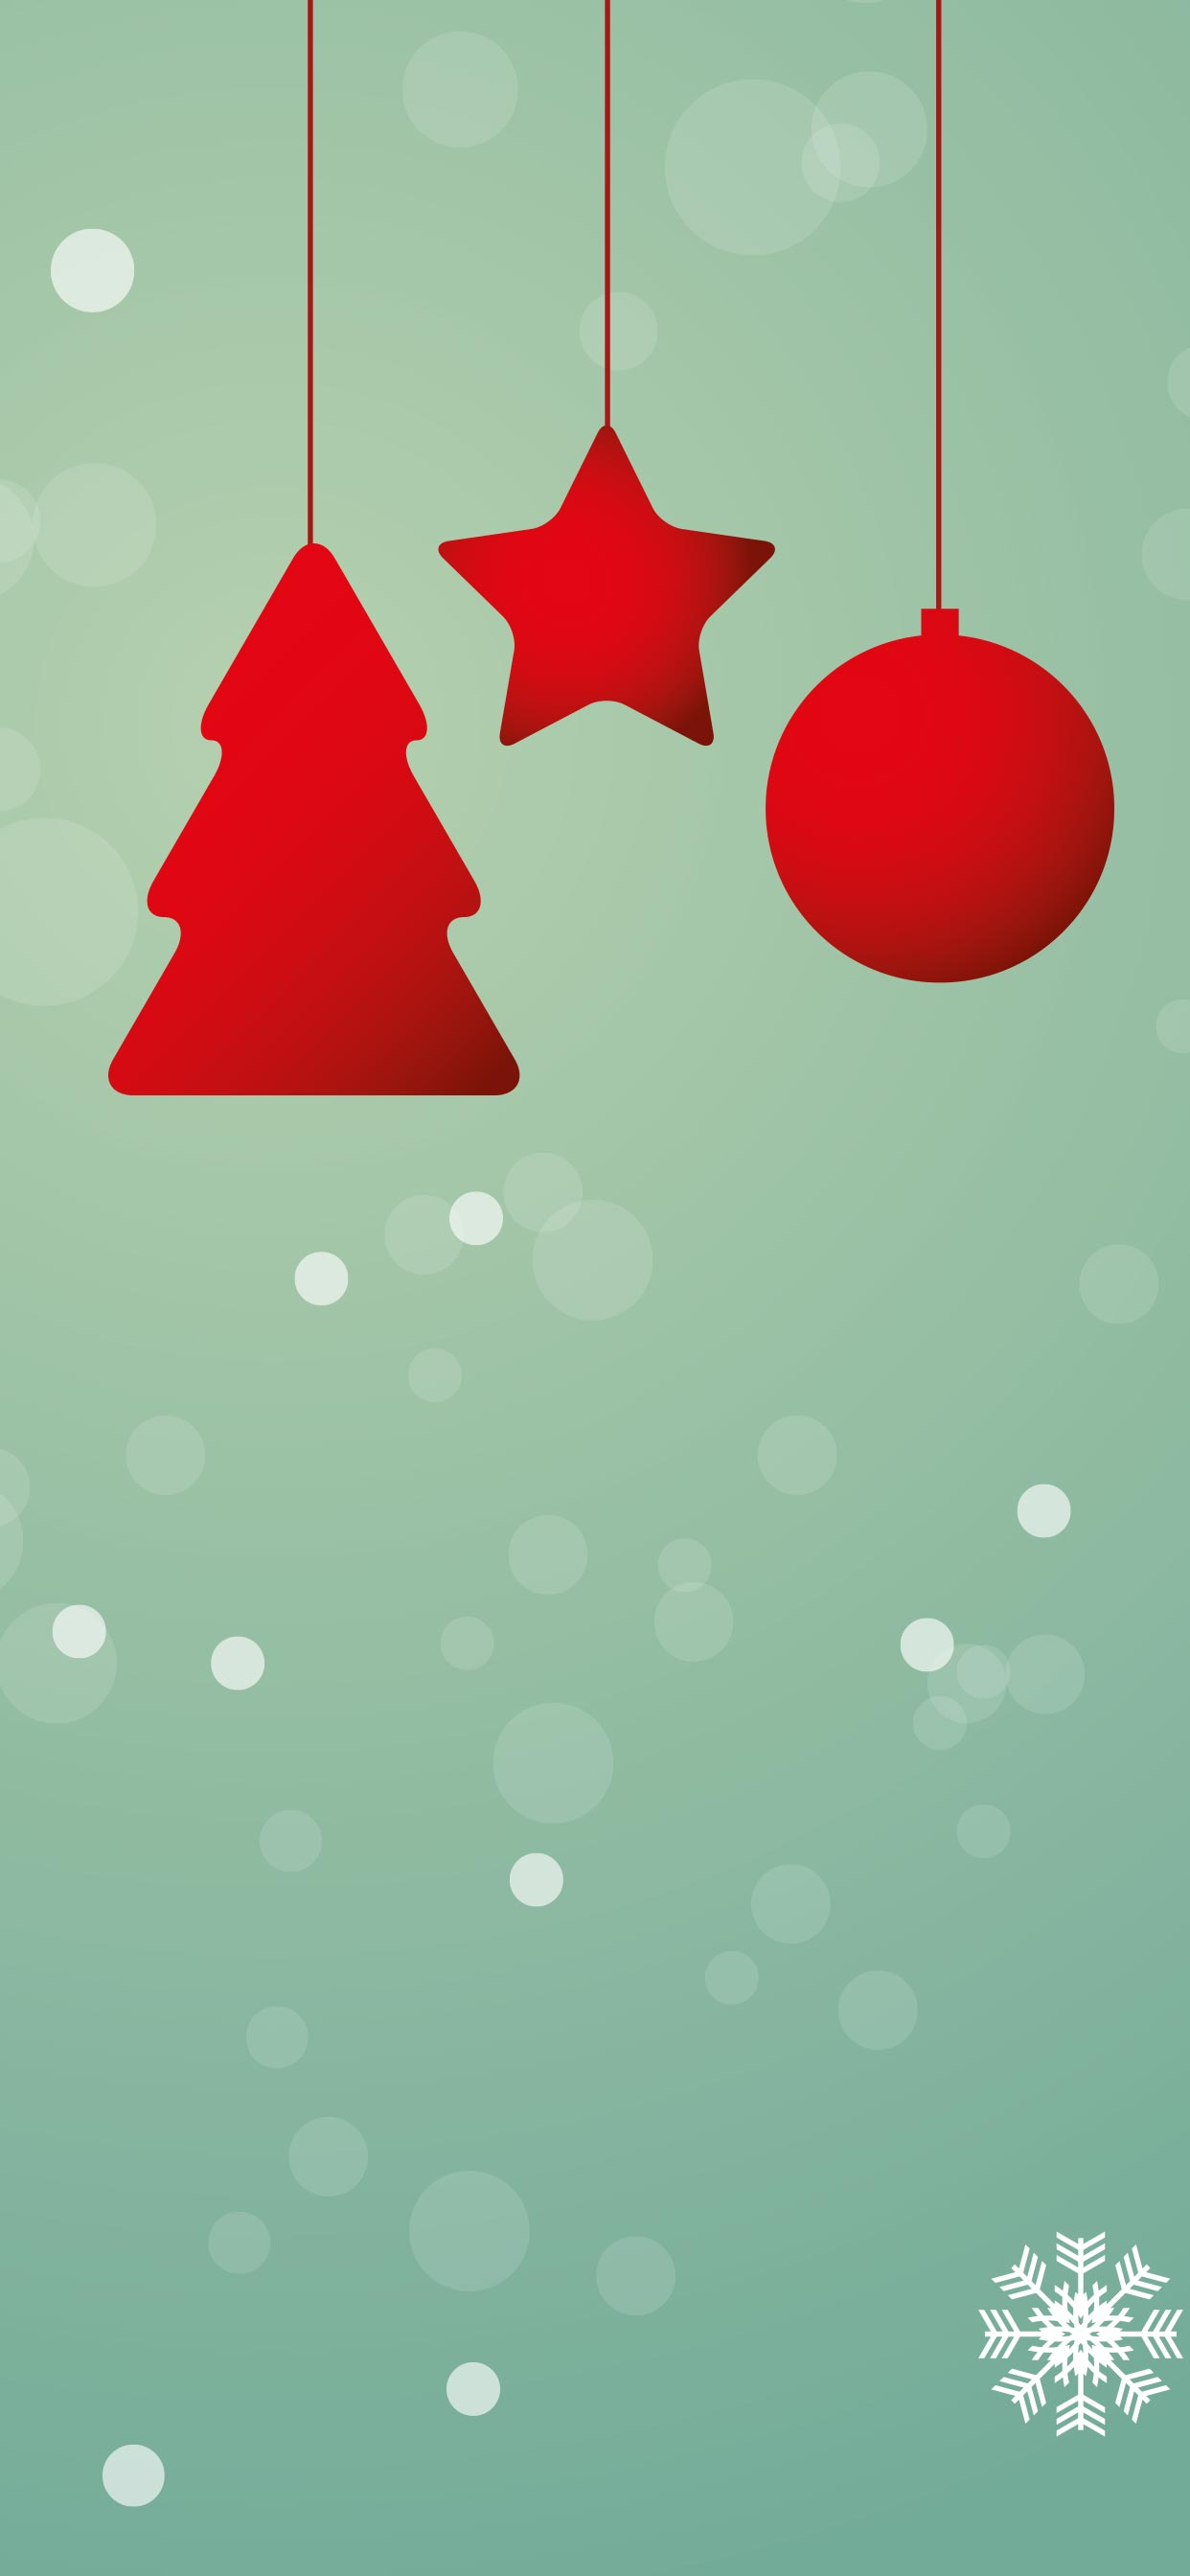 Christmas Ornaments iPhone 11 Pro Max Wallpaper 1